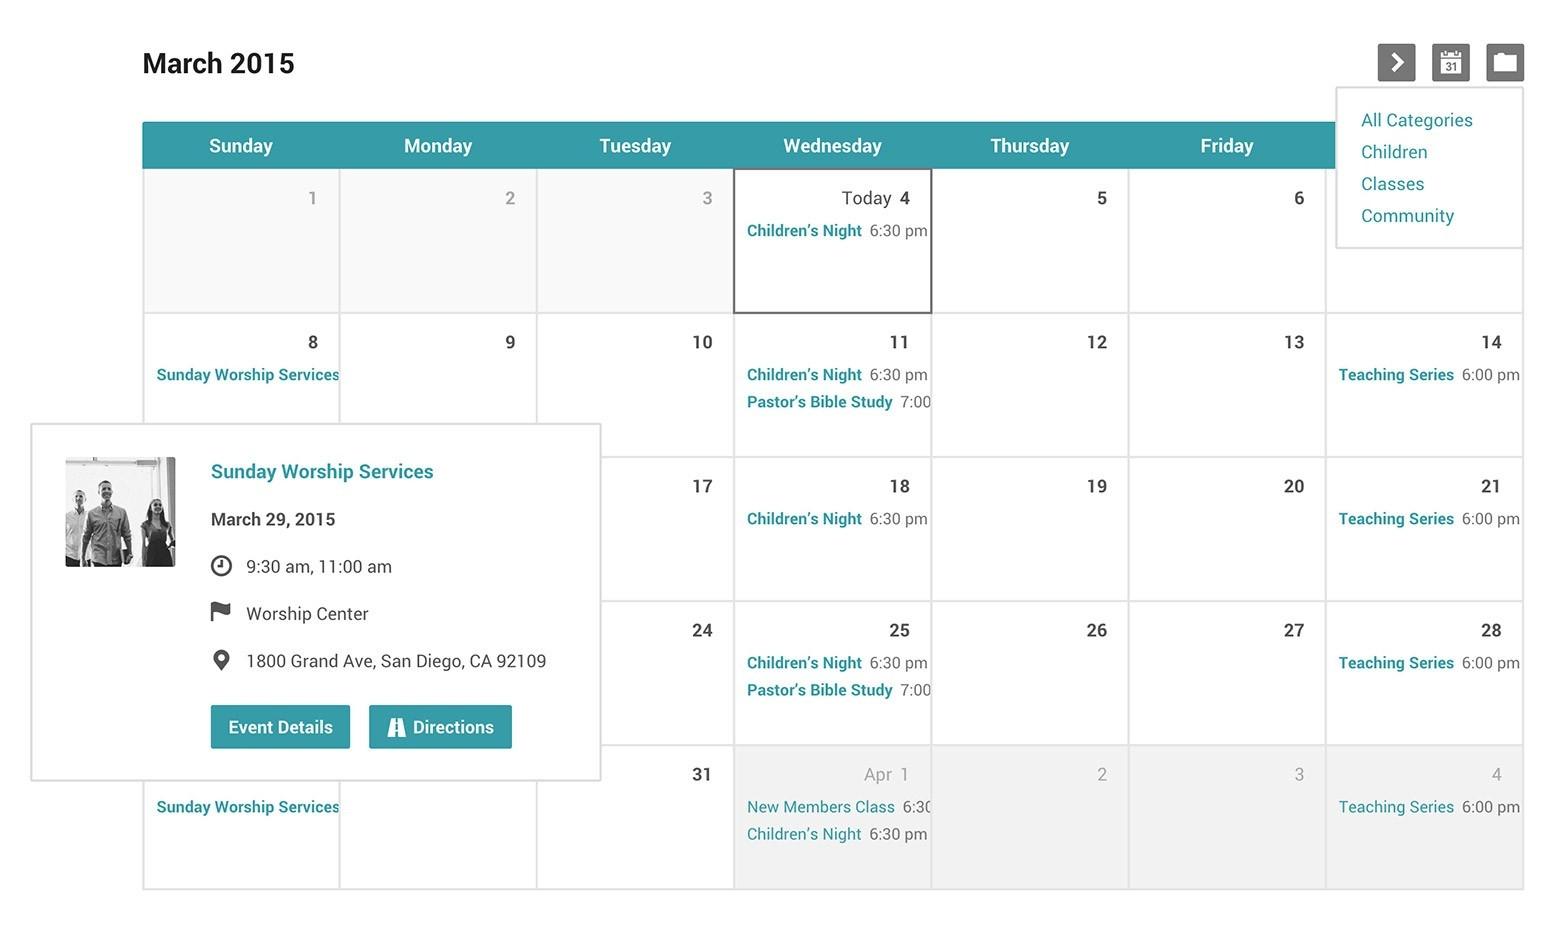 Depo Provera Perpetual Calendar 2021 | Calendar Printables  Printable Depo Provera Perpetual Calendar 2021